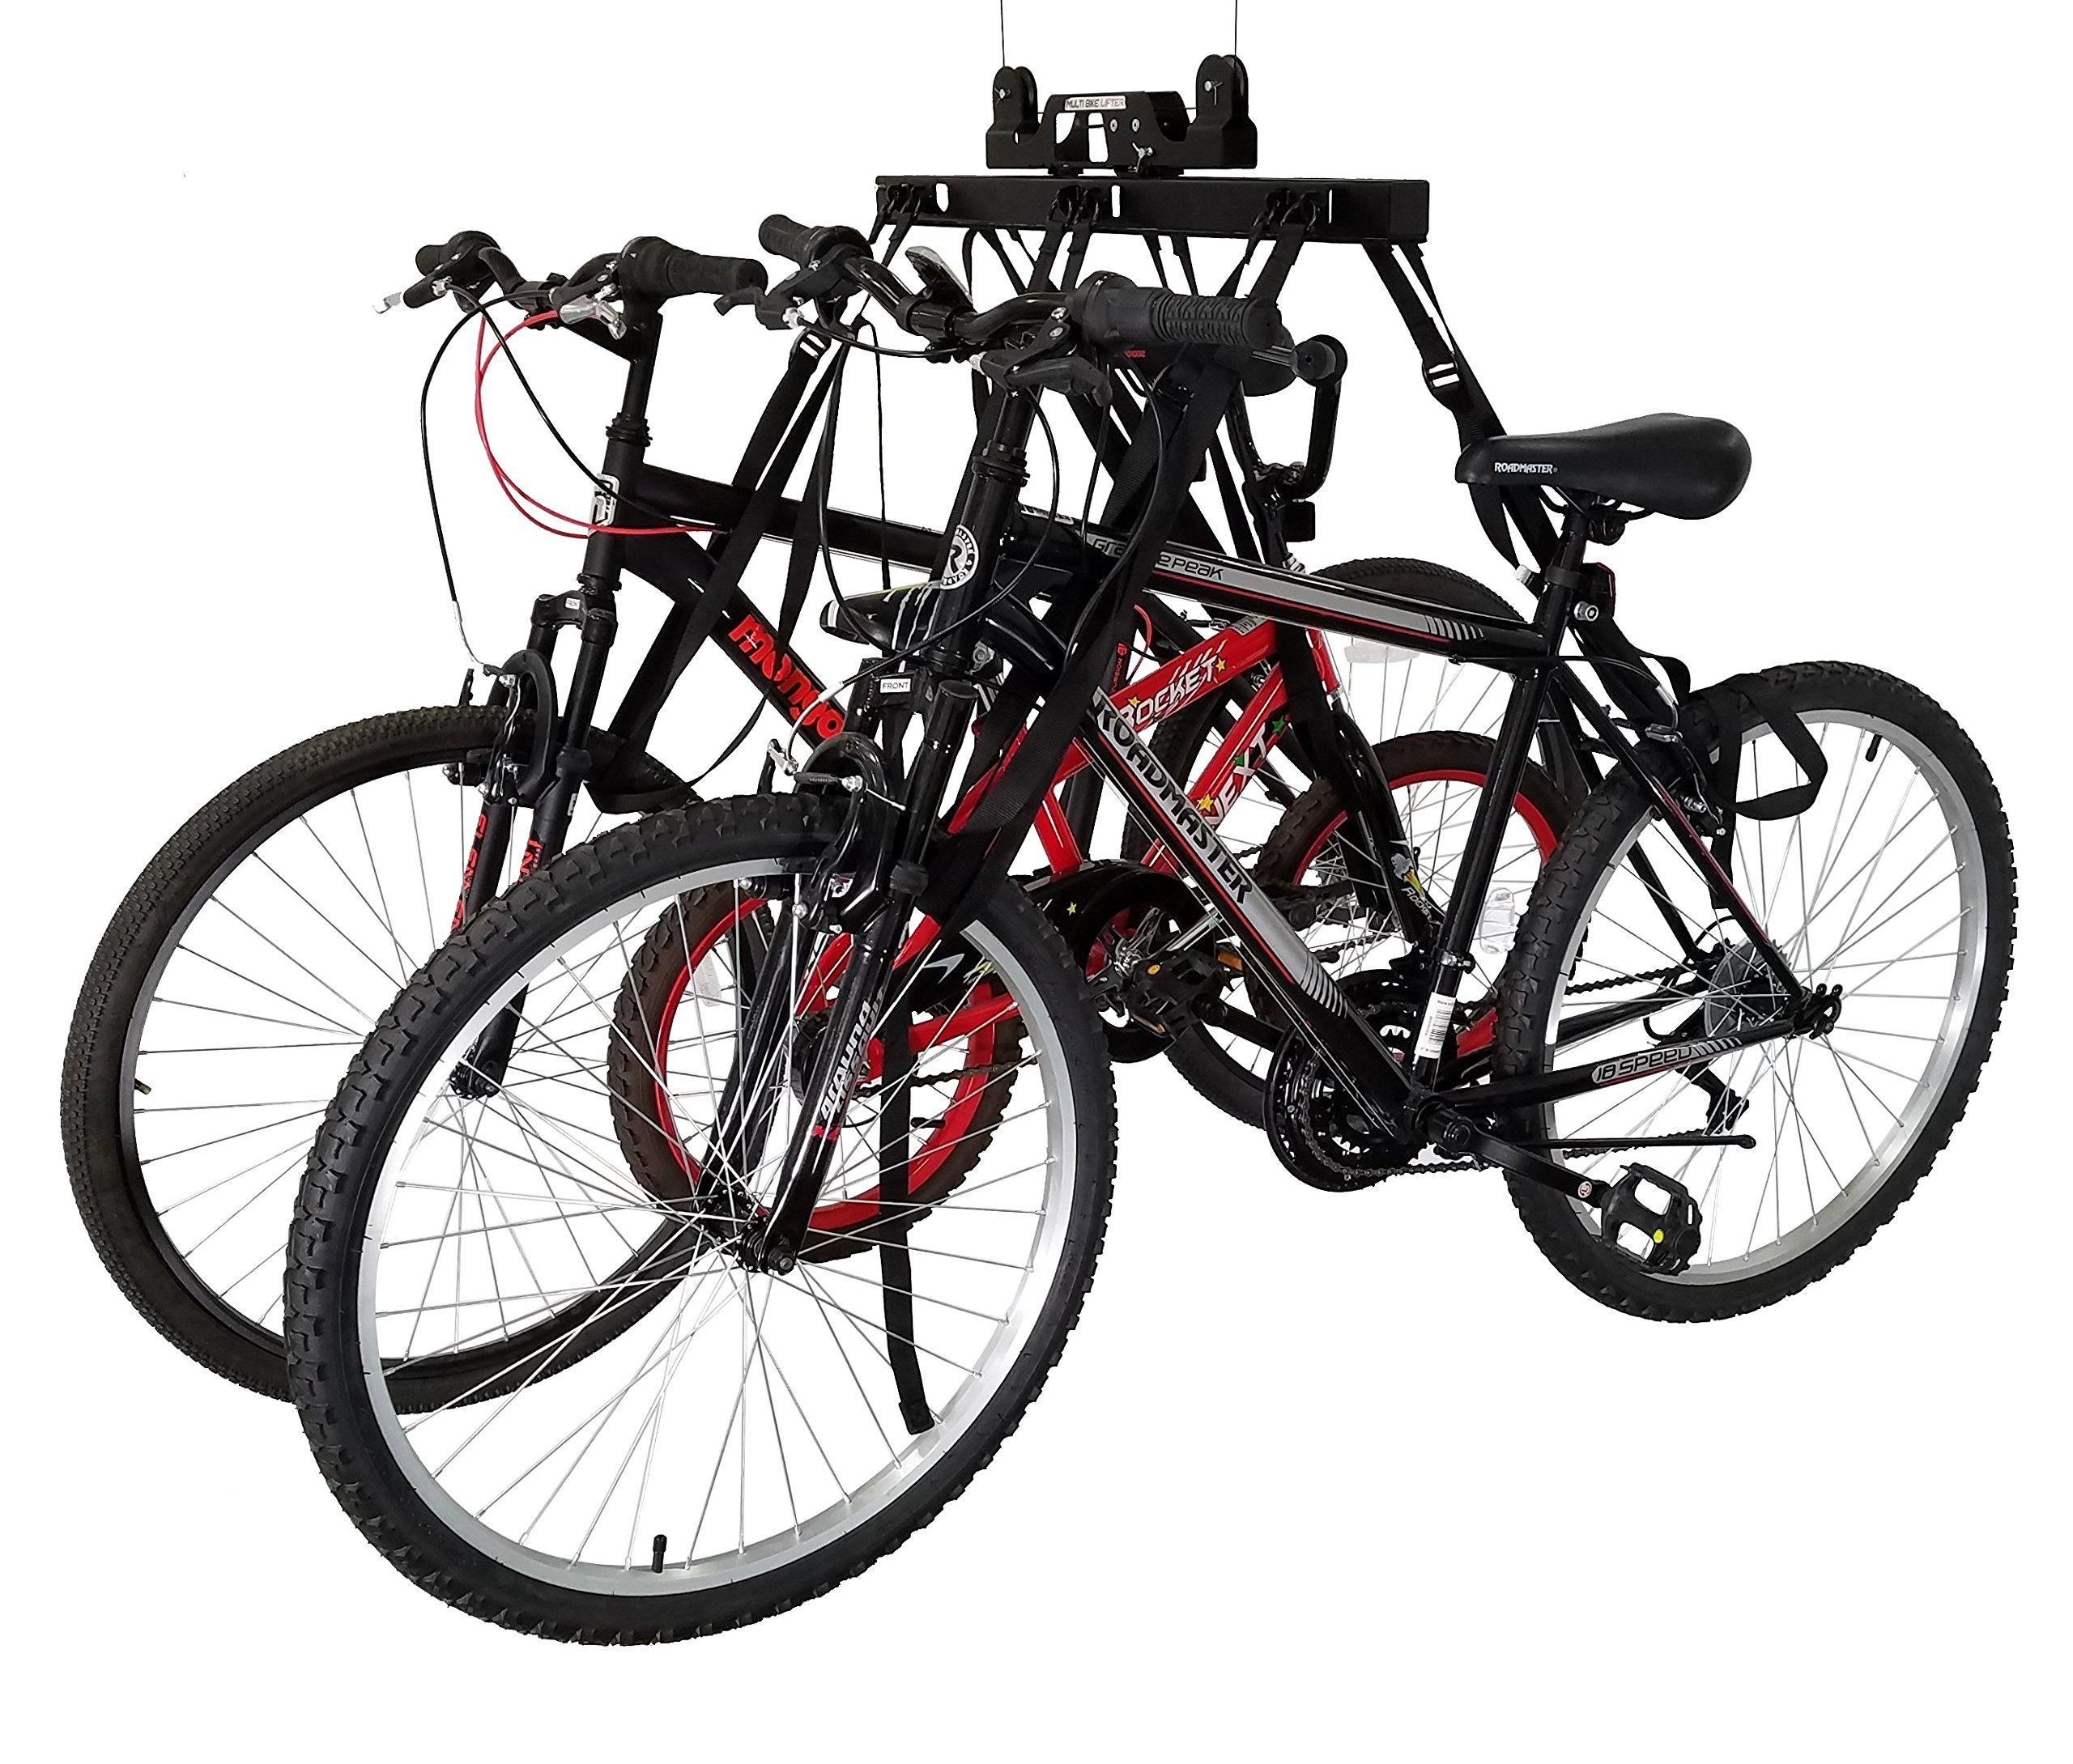 Bike Lift Ceiling Hoist Garage Storage | Smartphone Controlled | 1,2, or 3 Bikes up to 100 lbs